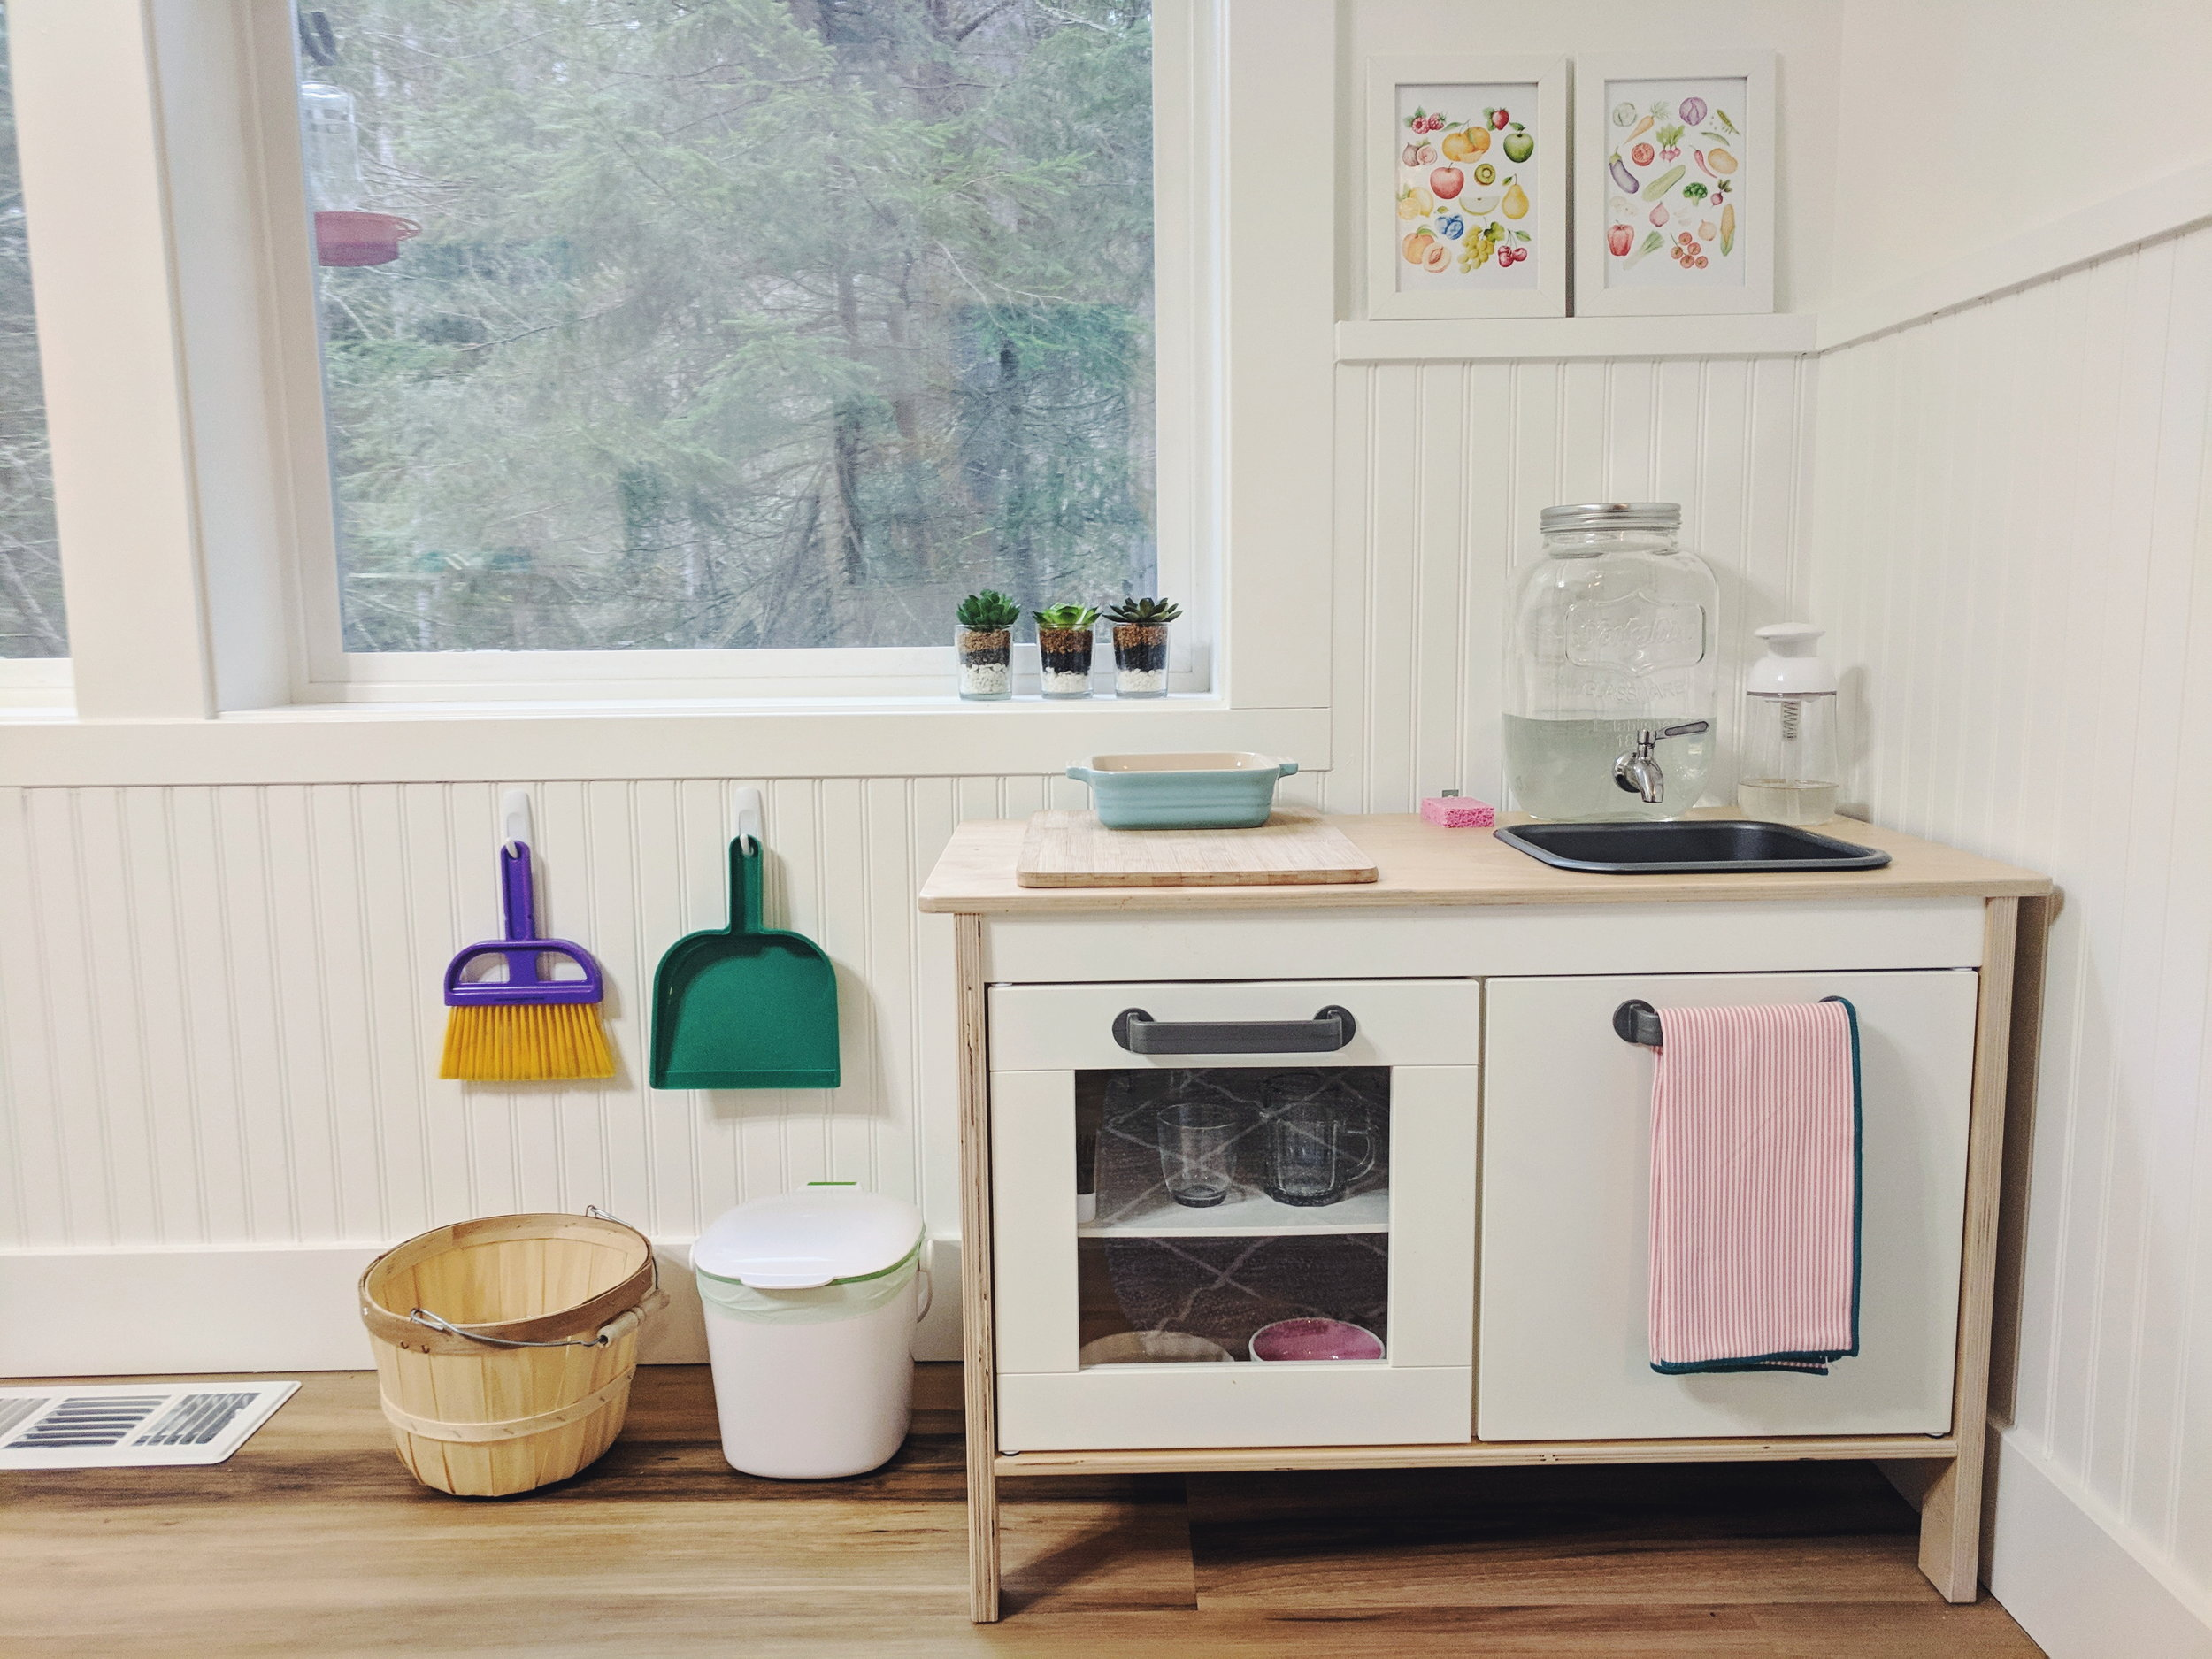 A Functional Montessori Toddler Kitchen Montessori In Real Life